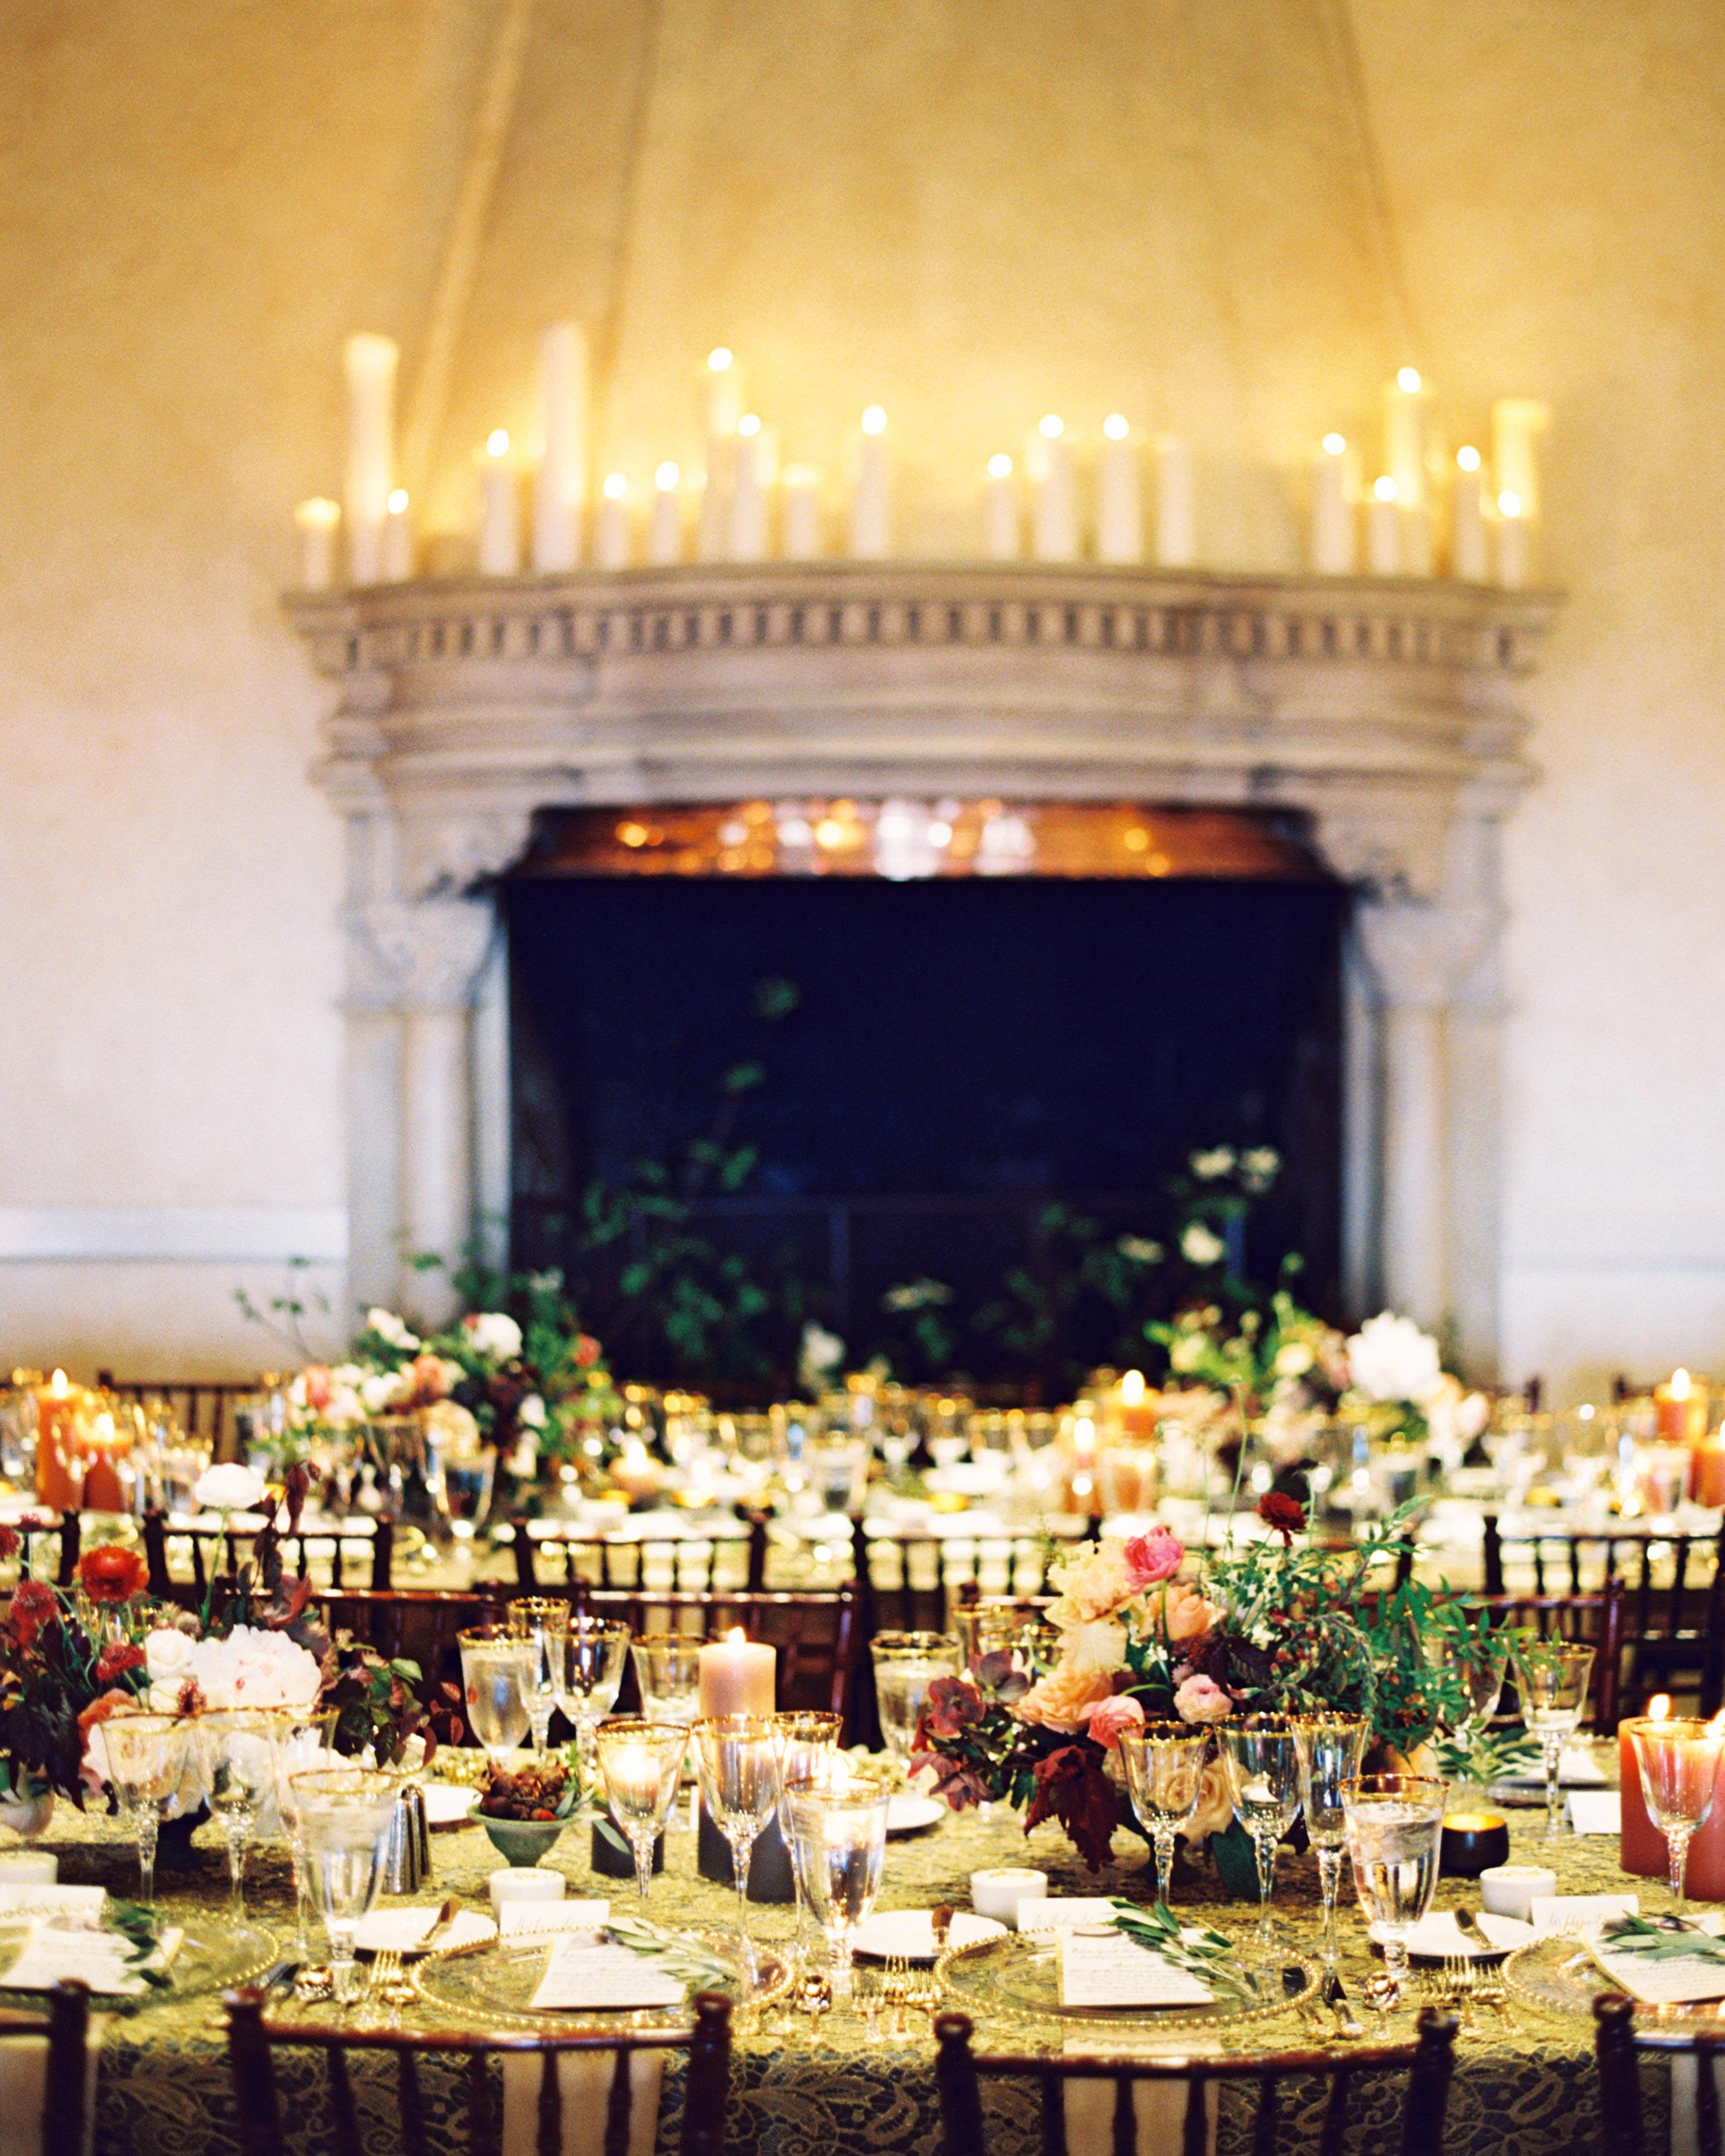 ginny-andrew-wedding-reception-0820-s112676-0216.jpg